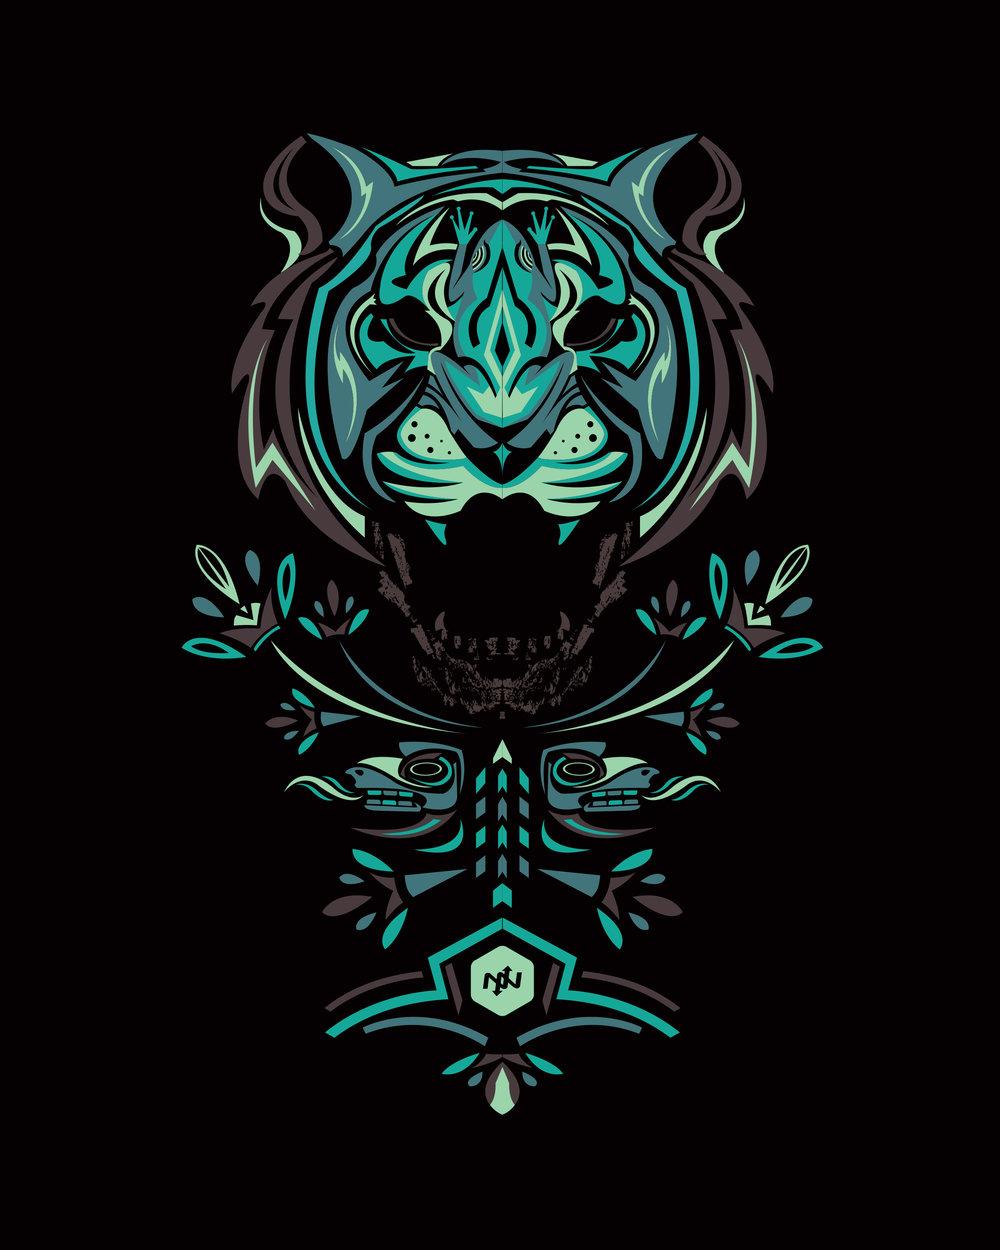 Onnit_lion.jpg